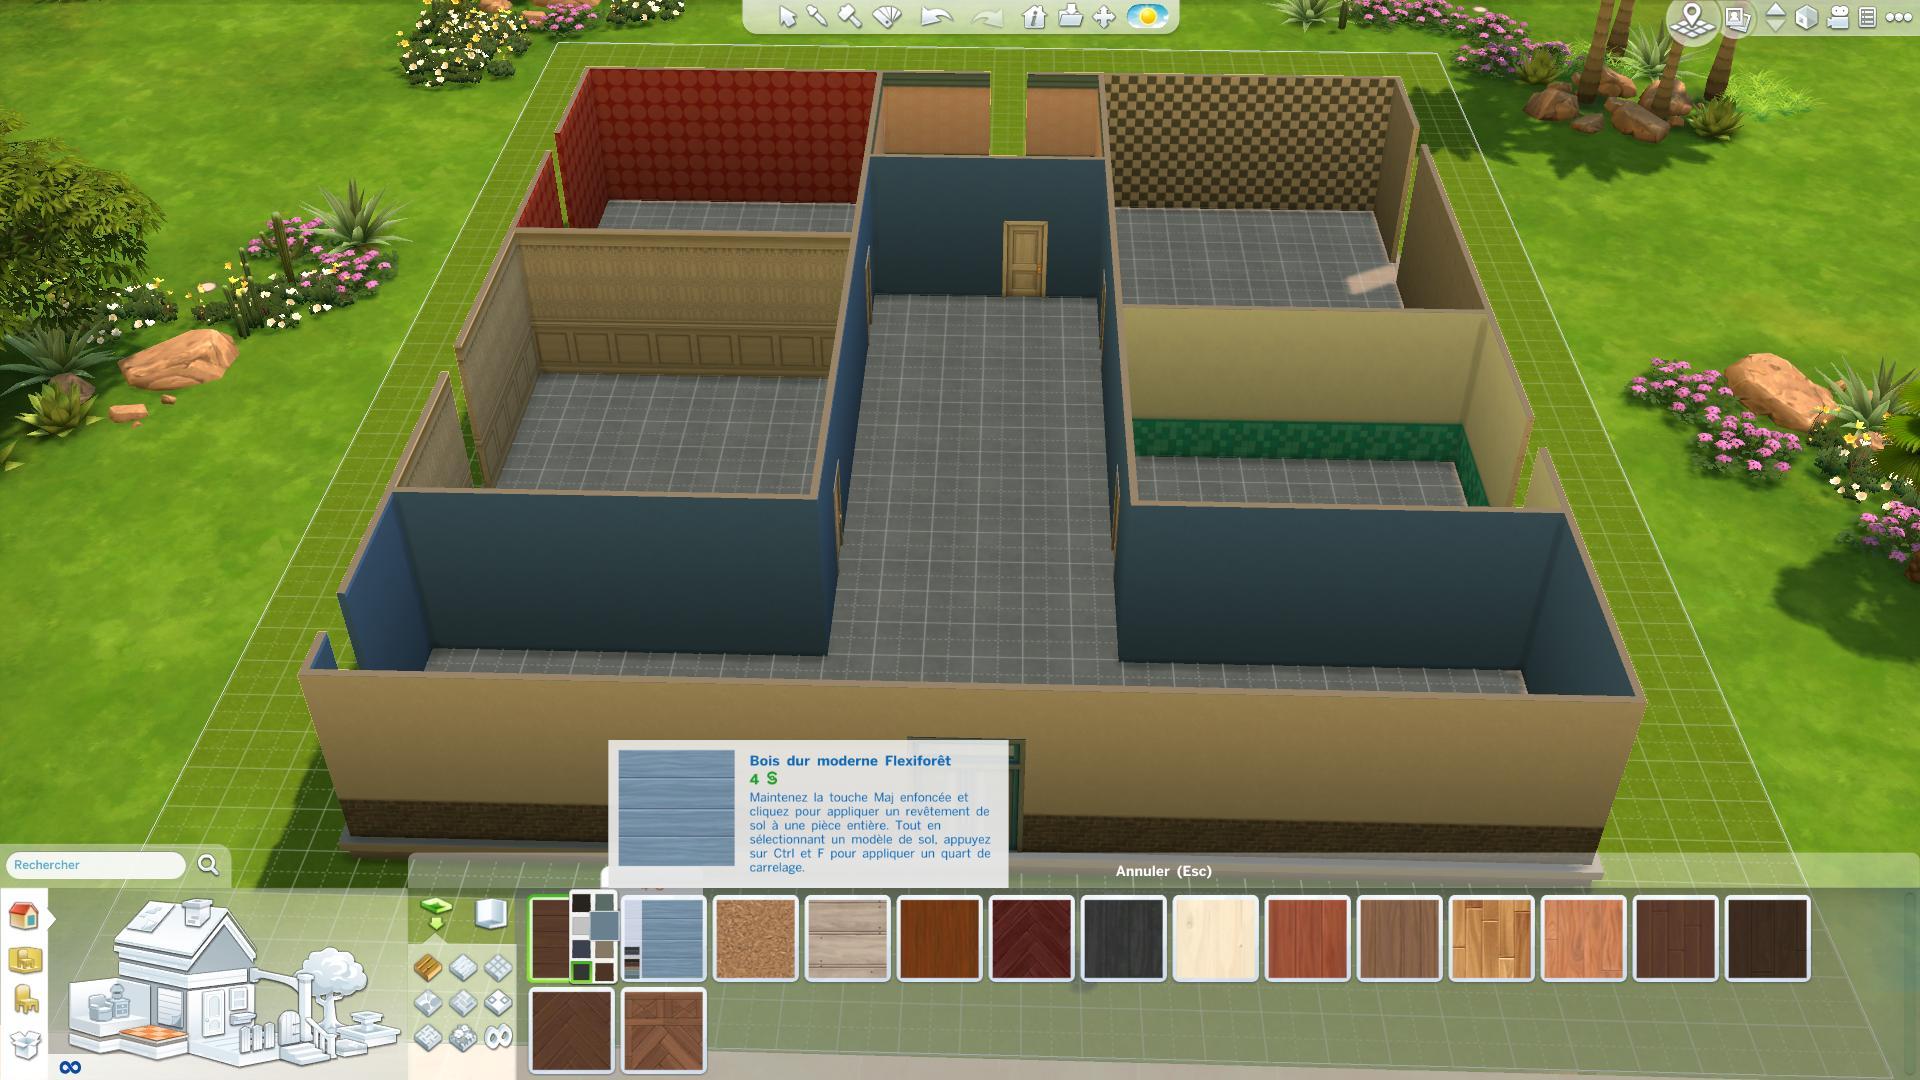 Les sims 4 construire sa maison 2 game guide for Construire une maison les sims 3